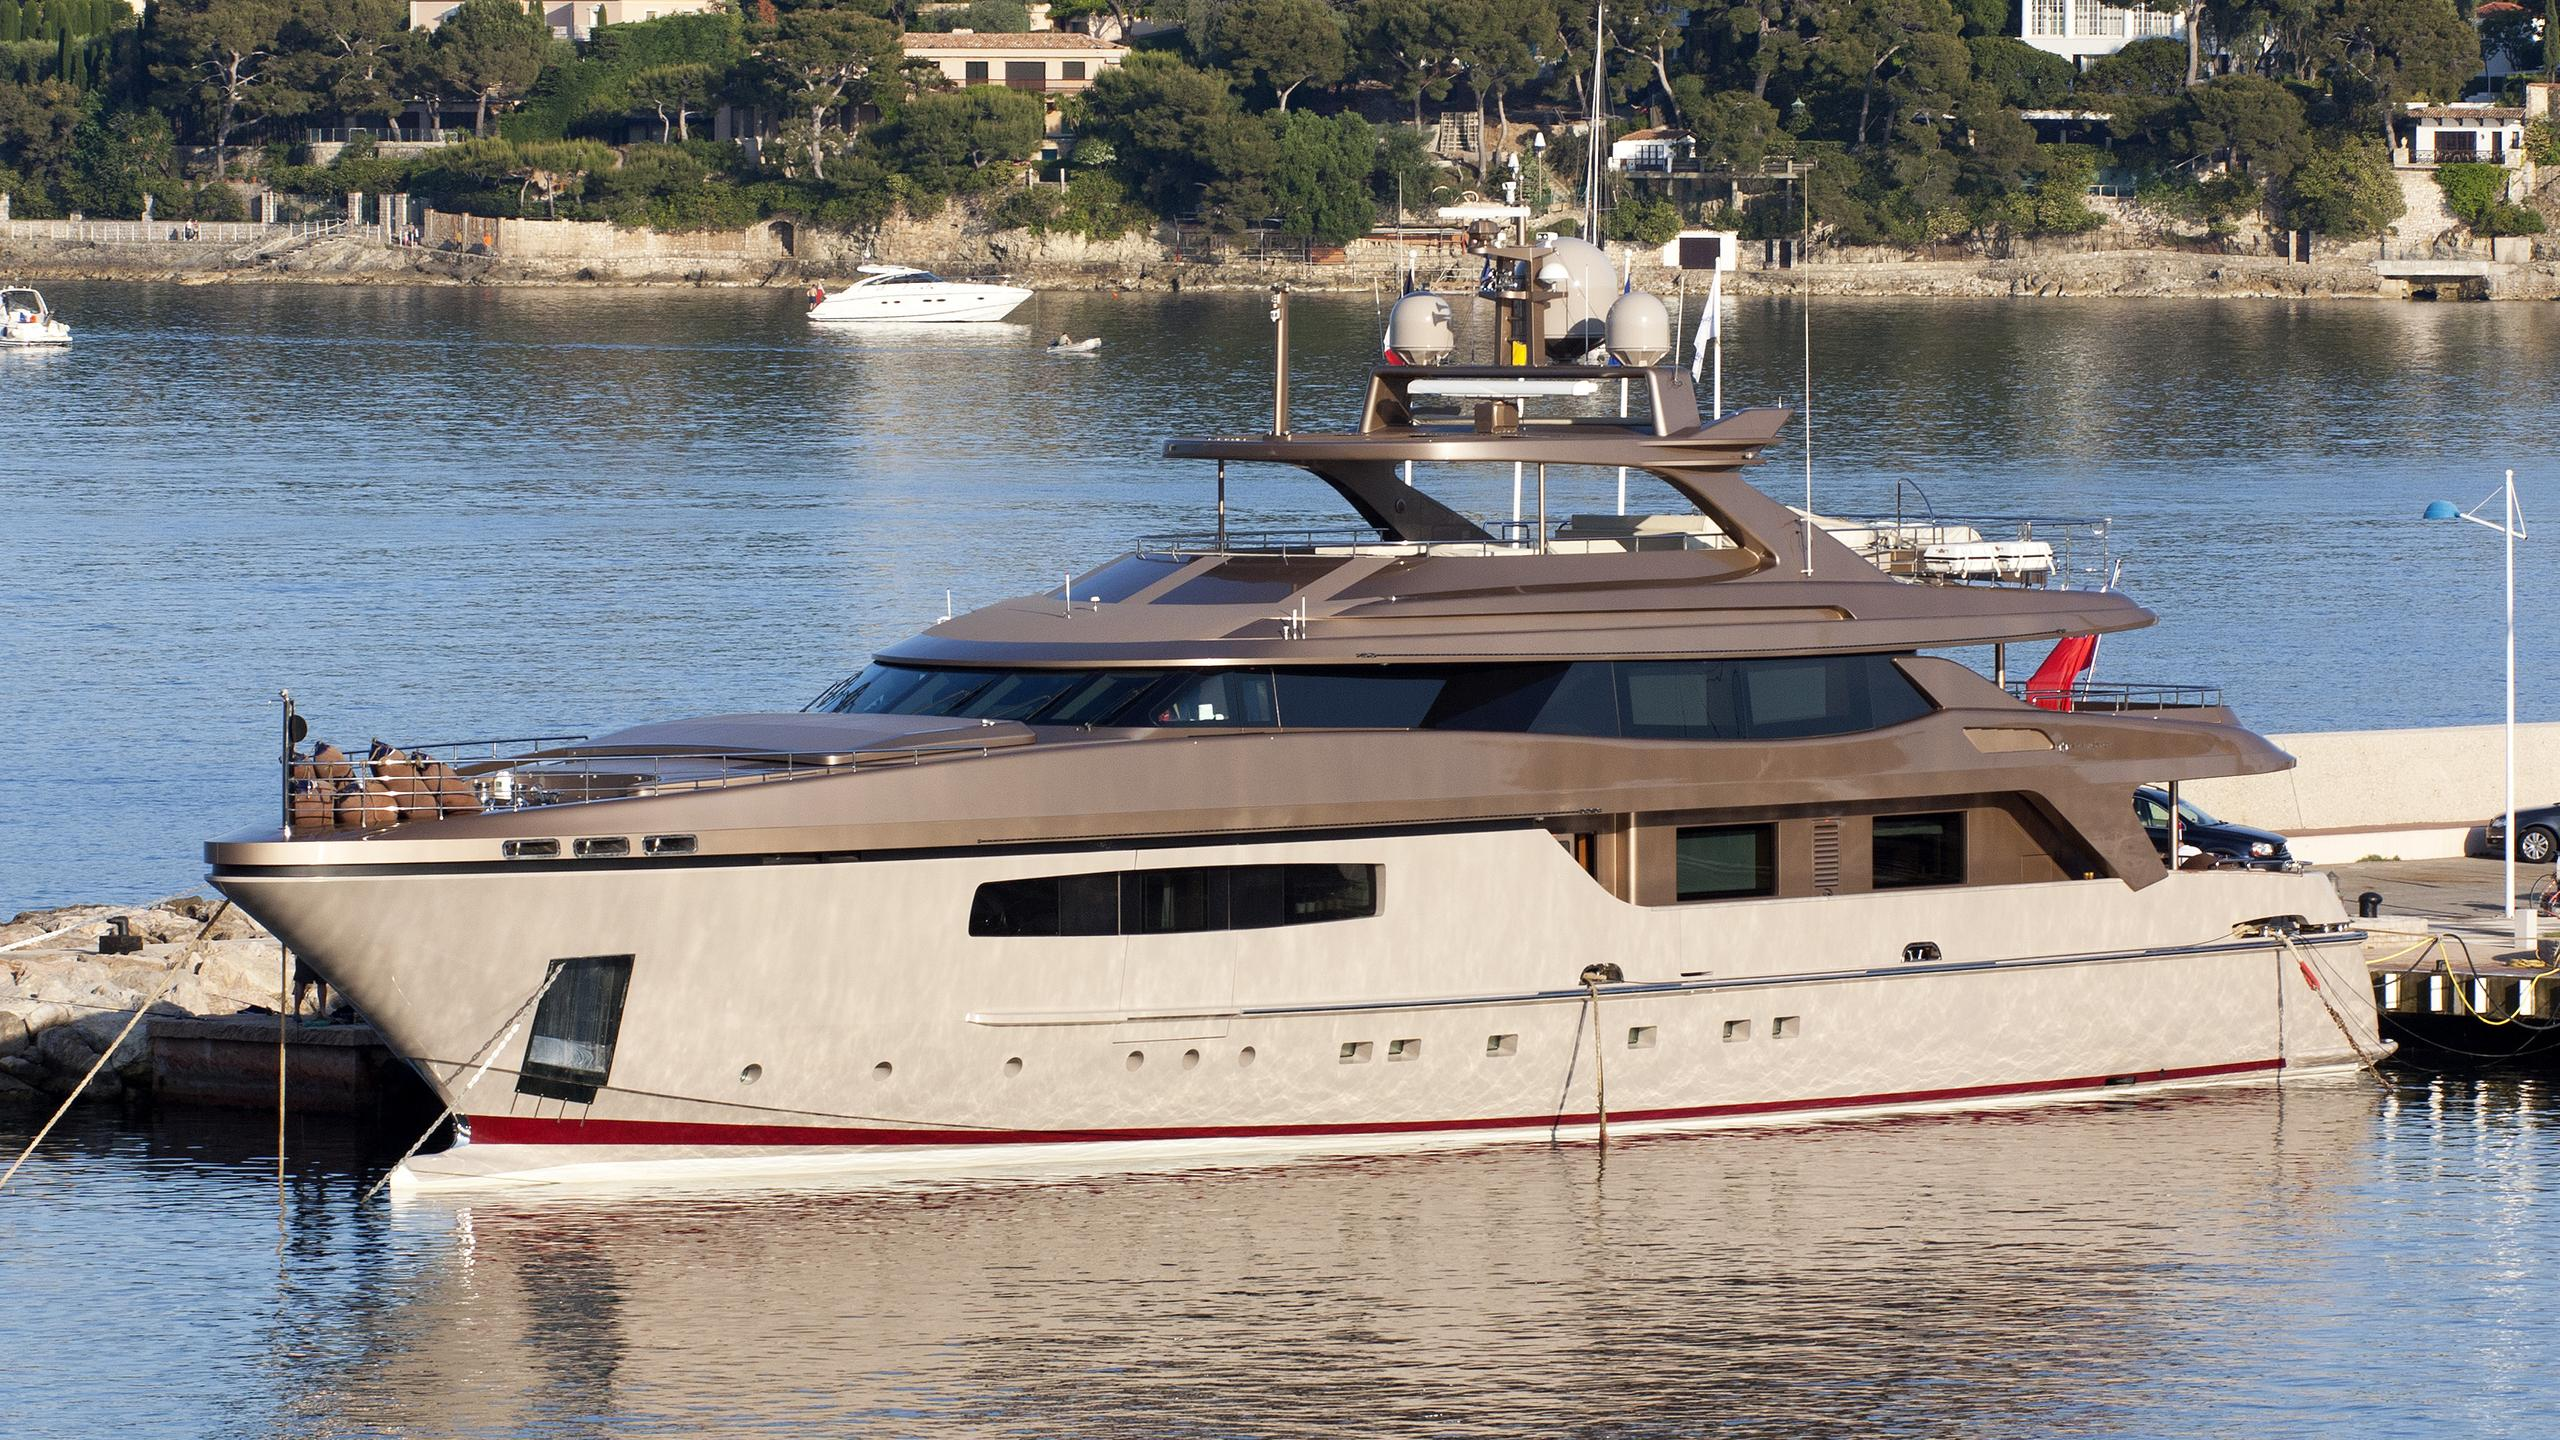 geosand-motor-yacht-baglietto-2011-42m-profile